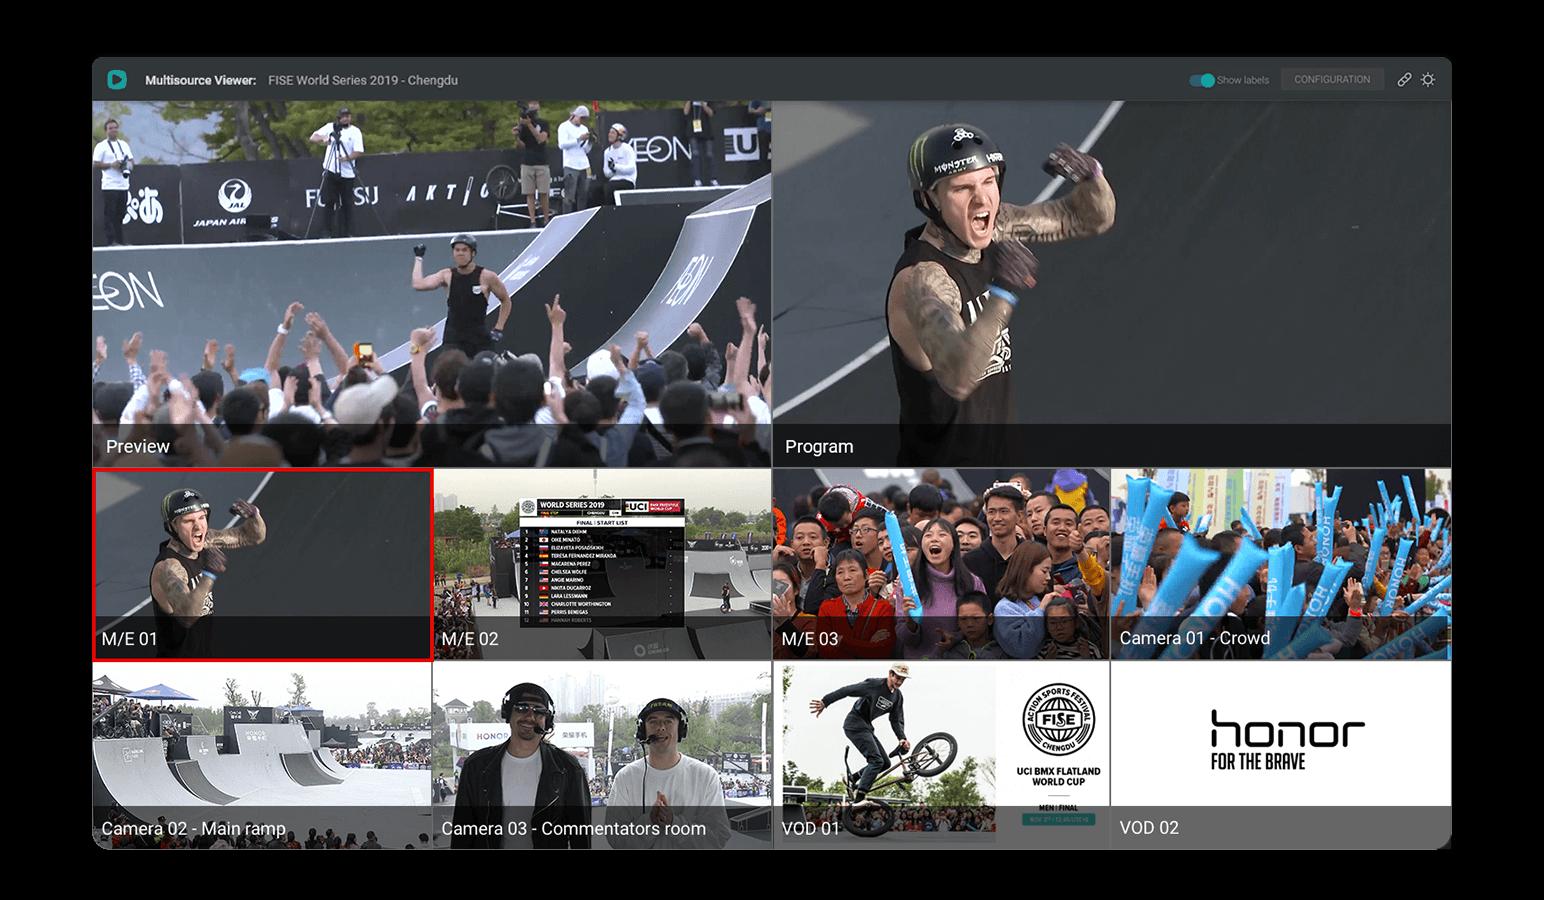 Stream Studio - Multi-viewer